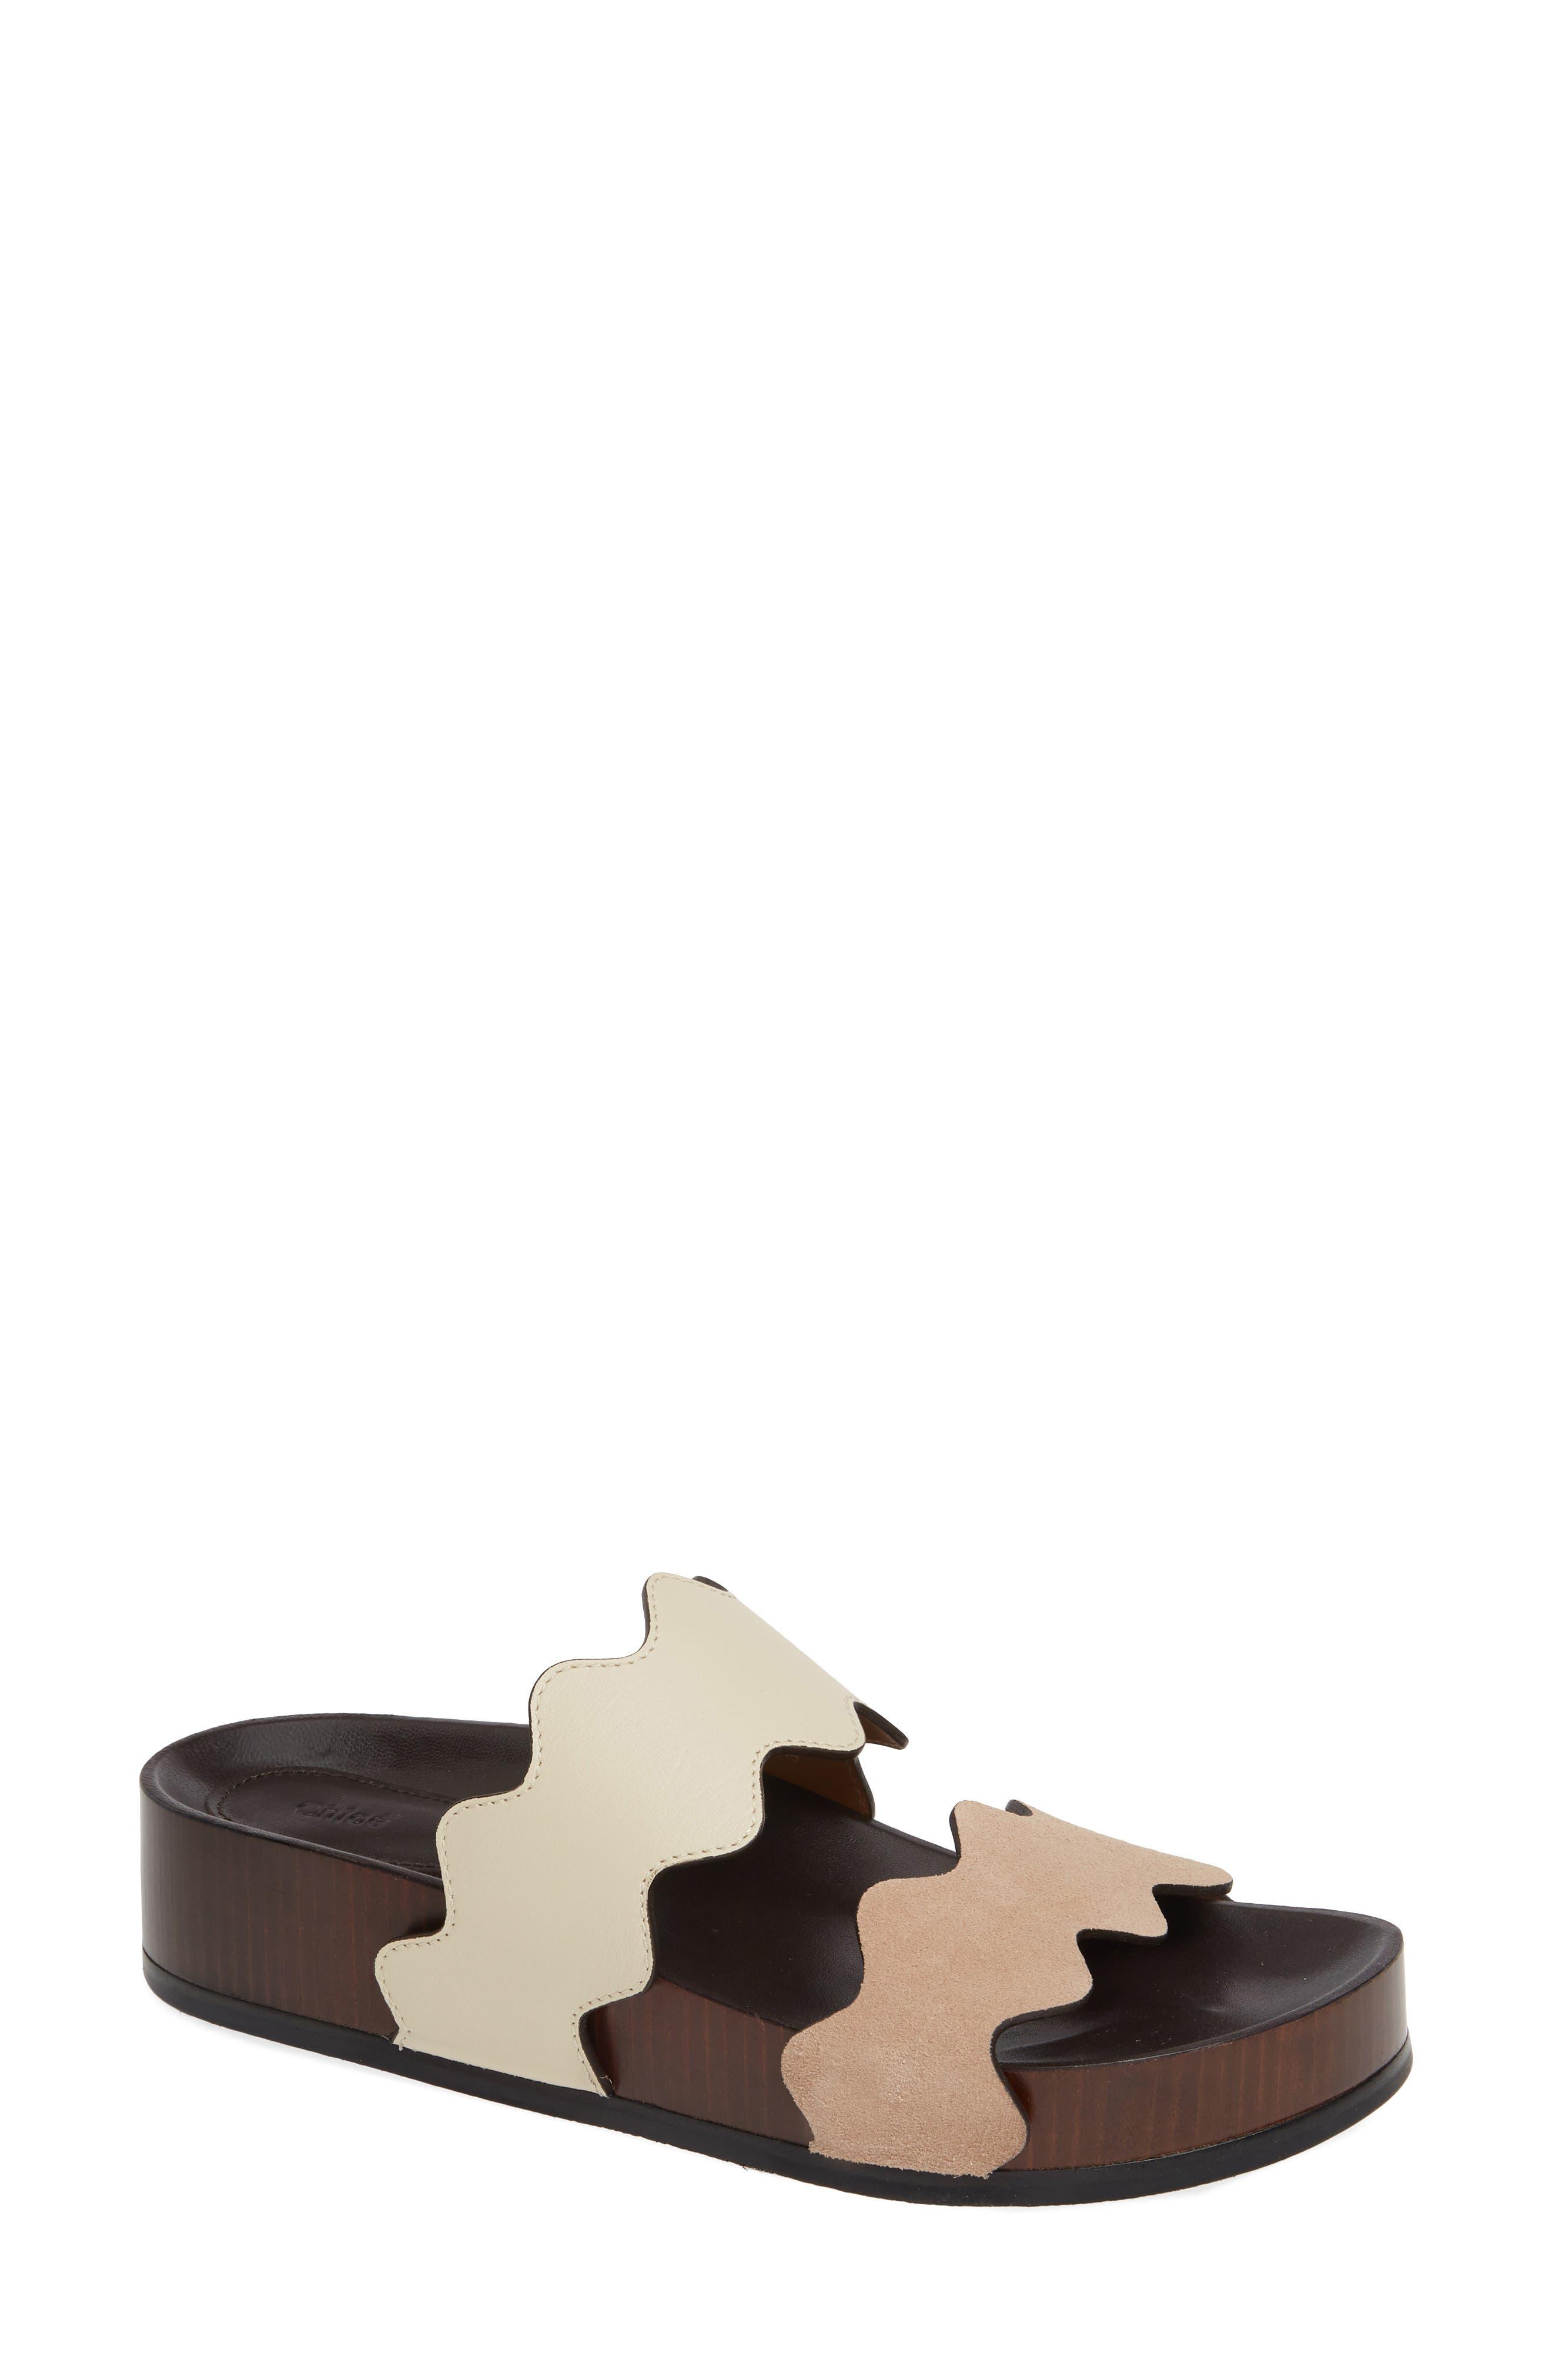 Lauren Platform Sandal,                         Main,                         color, BEIGE MULTI